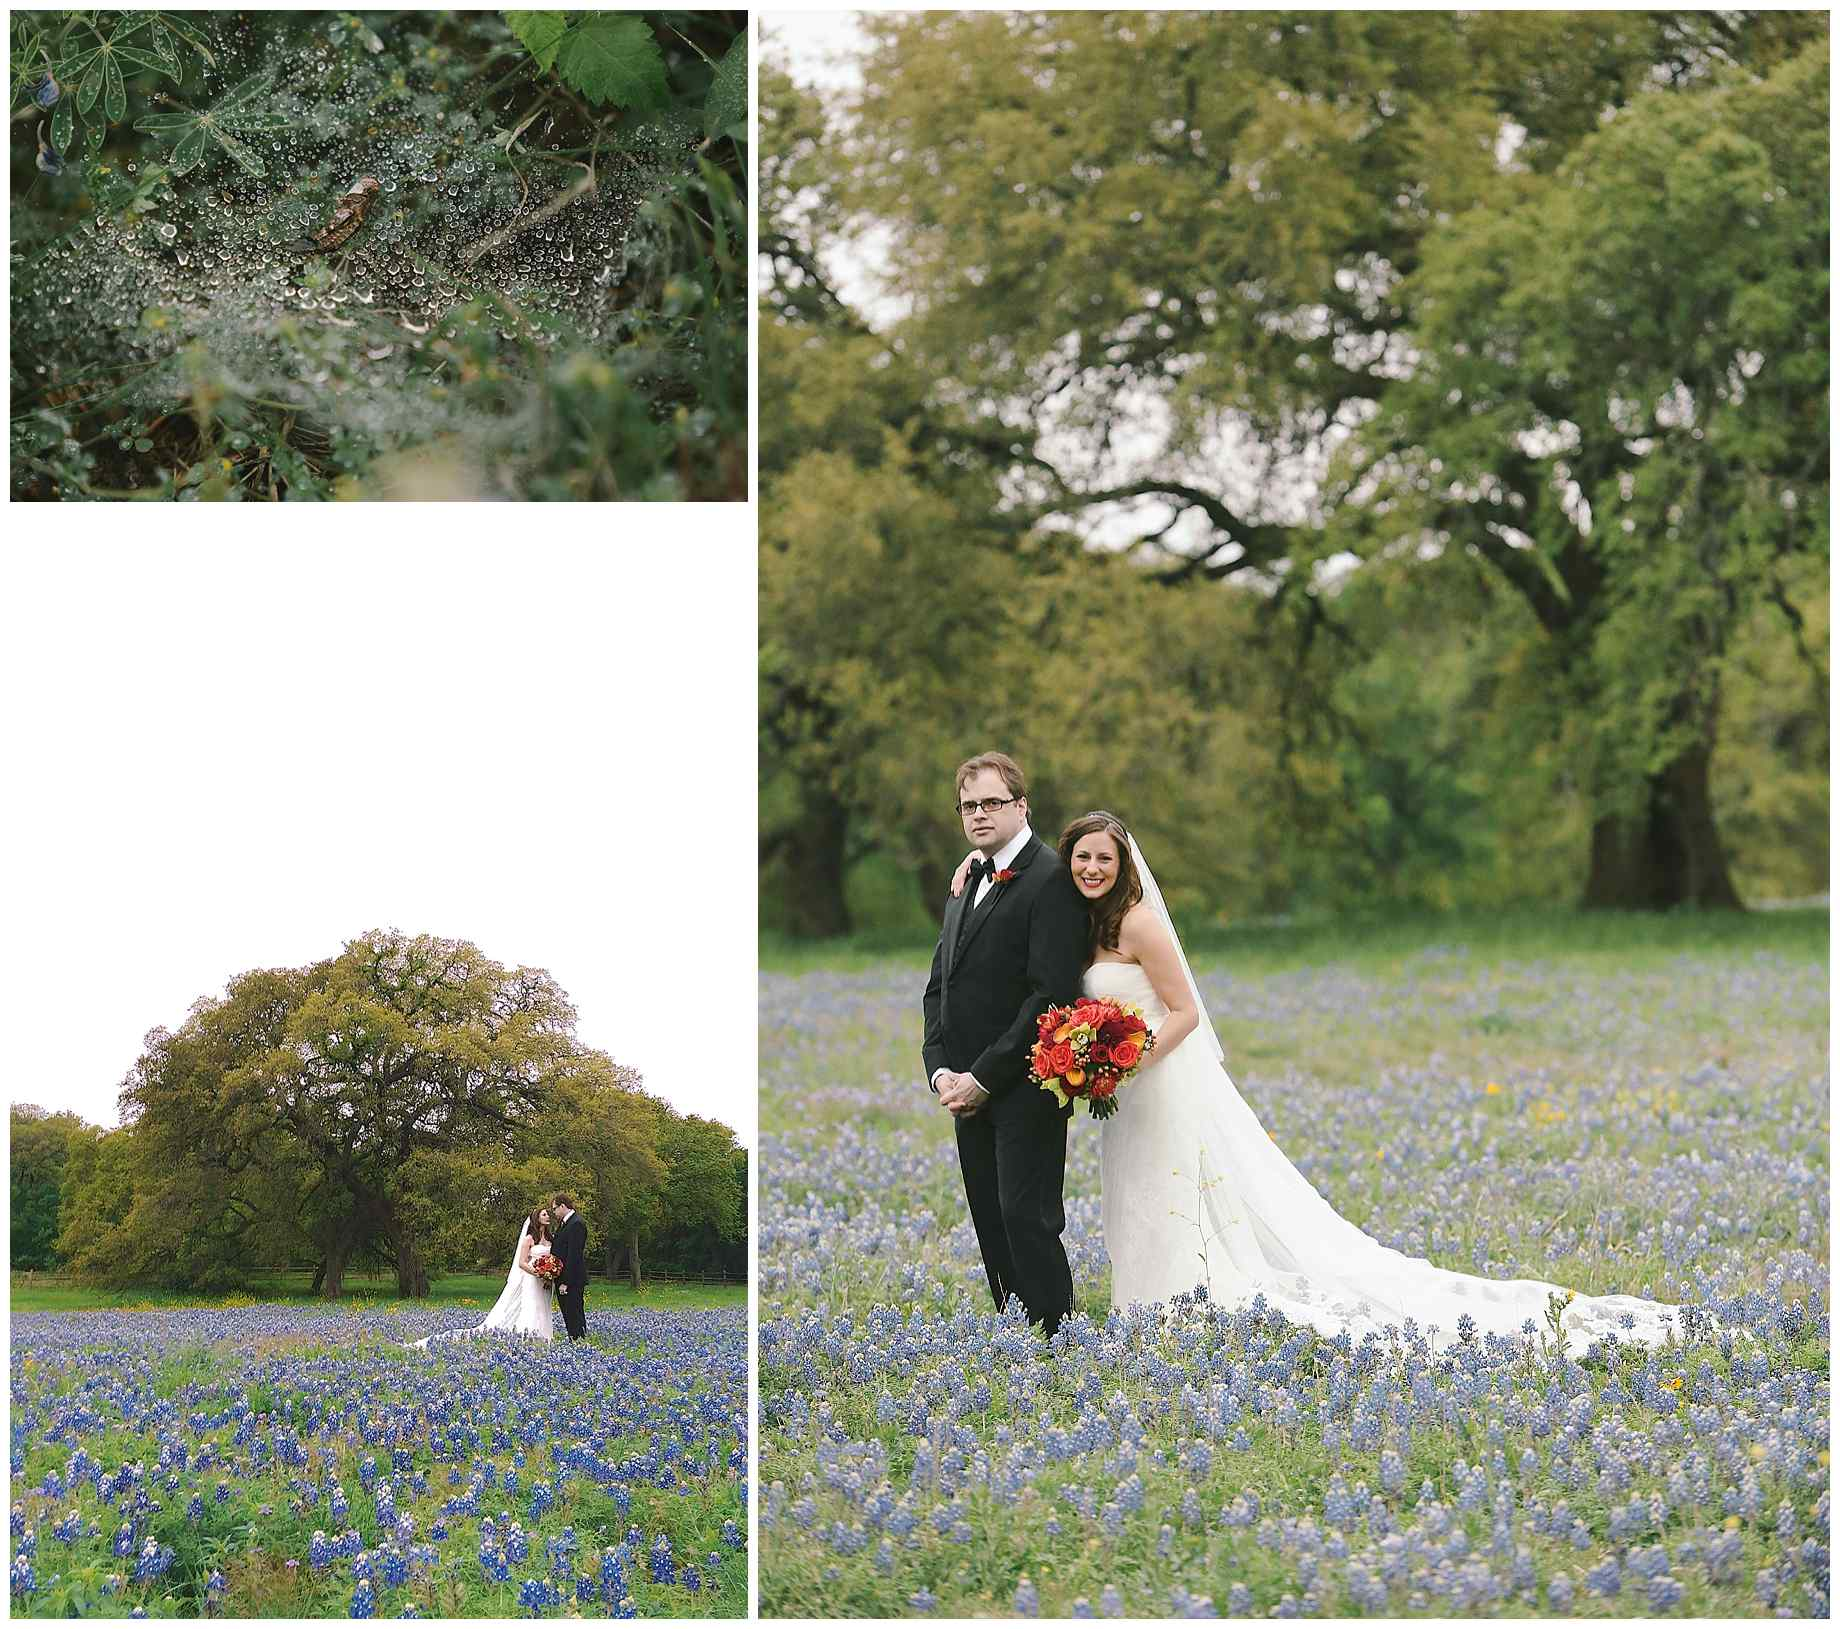 vineyard-at-the-chappel-lodge-wedding-photographer-15